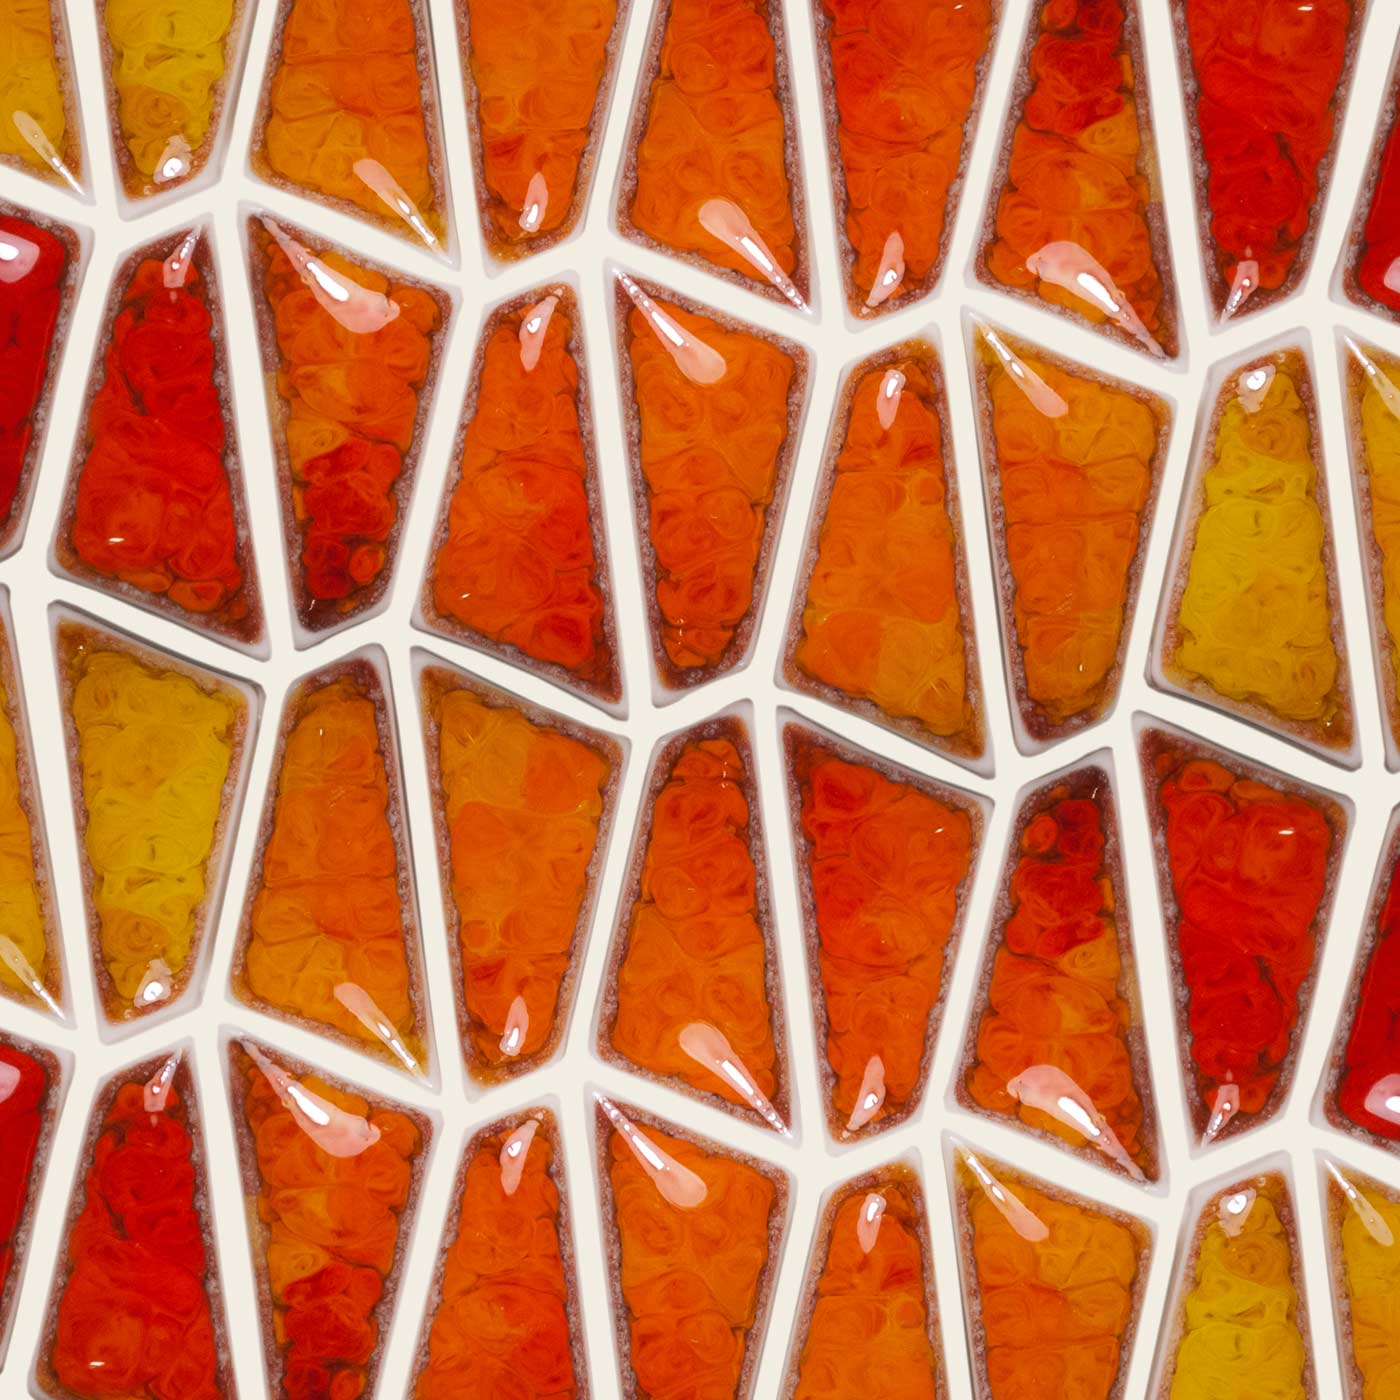 Partner Porcelain Orange and Red Glazed Centerpieces